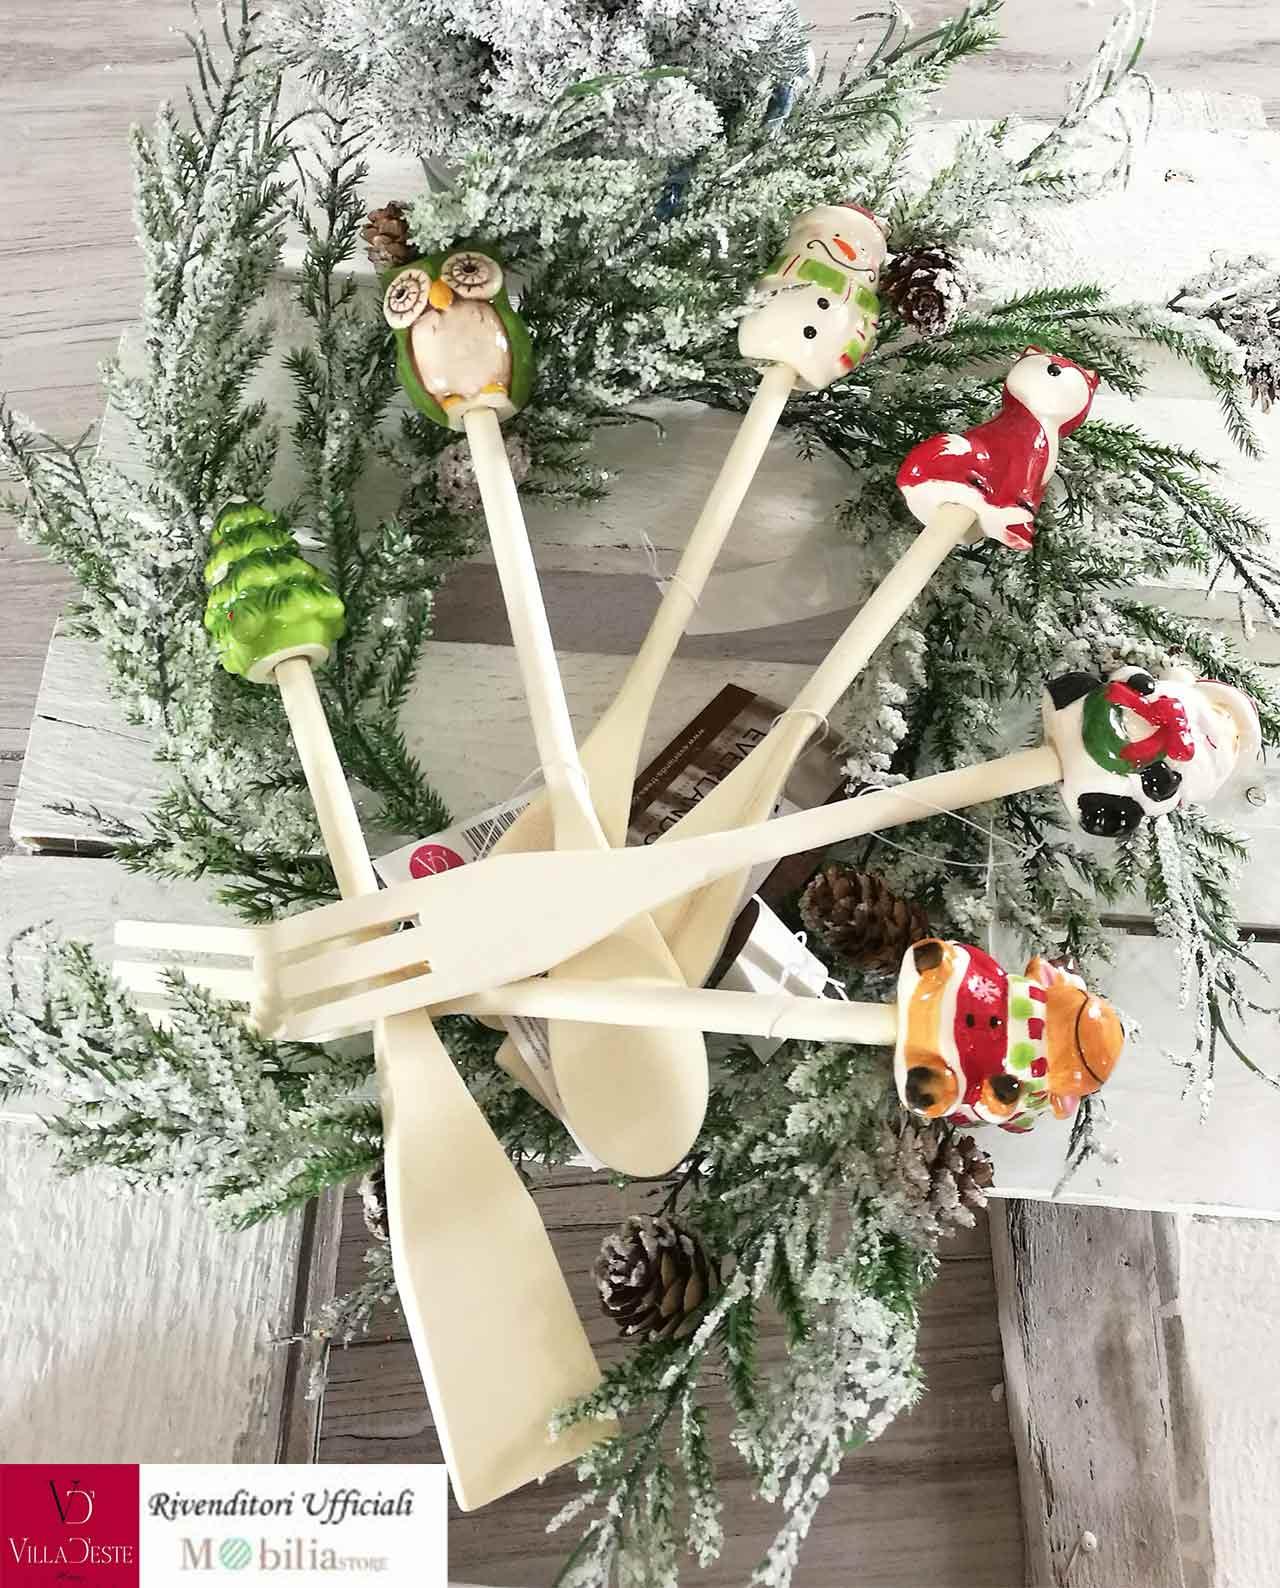 Utensili da cucina natalizi varie forme - Mobilia Store Home & Favours